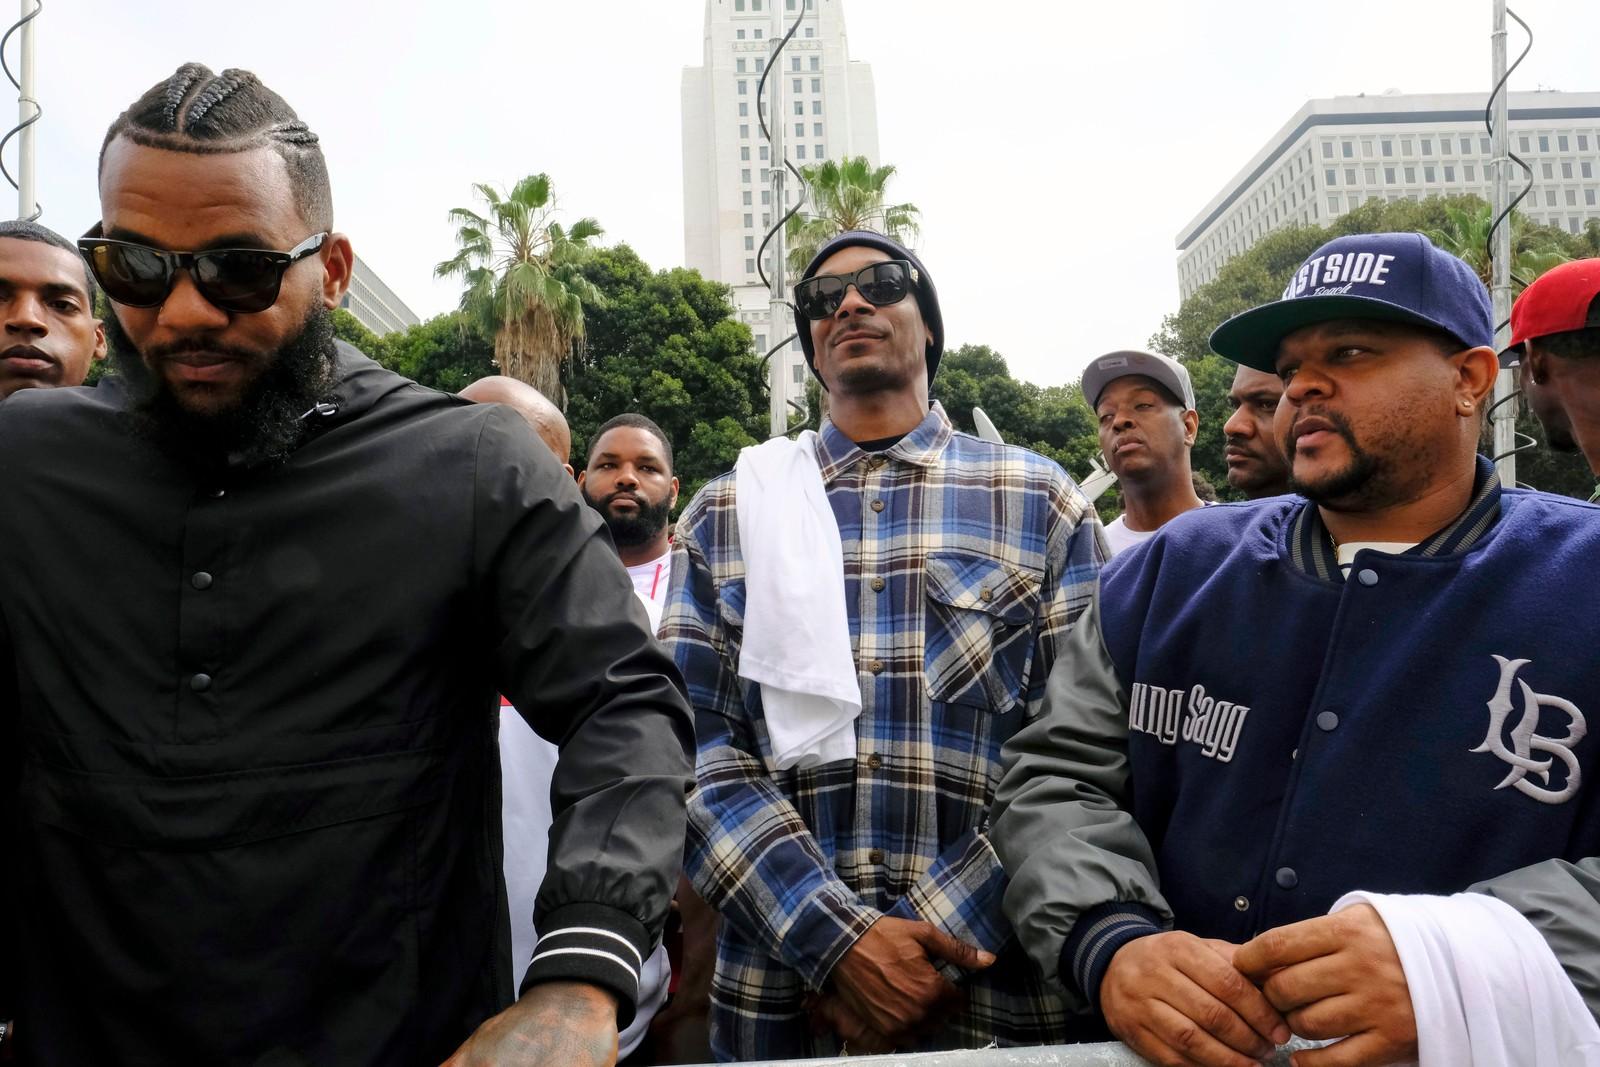 LOS ANGELES: I Los Angeles ledet rapperne Snoop Dogg og The Game en fredelig marsj til hovedpolitistasjonen i Los Angeles.